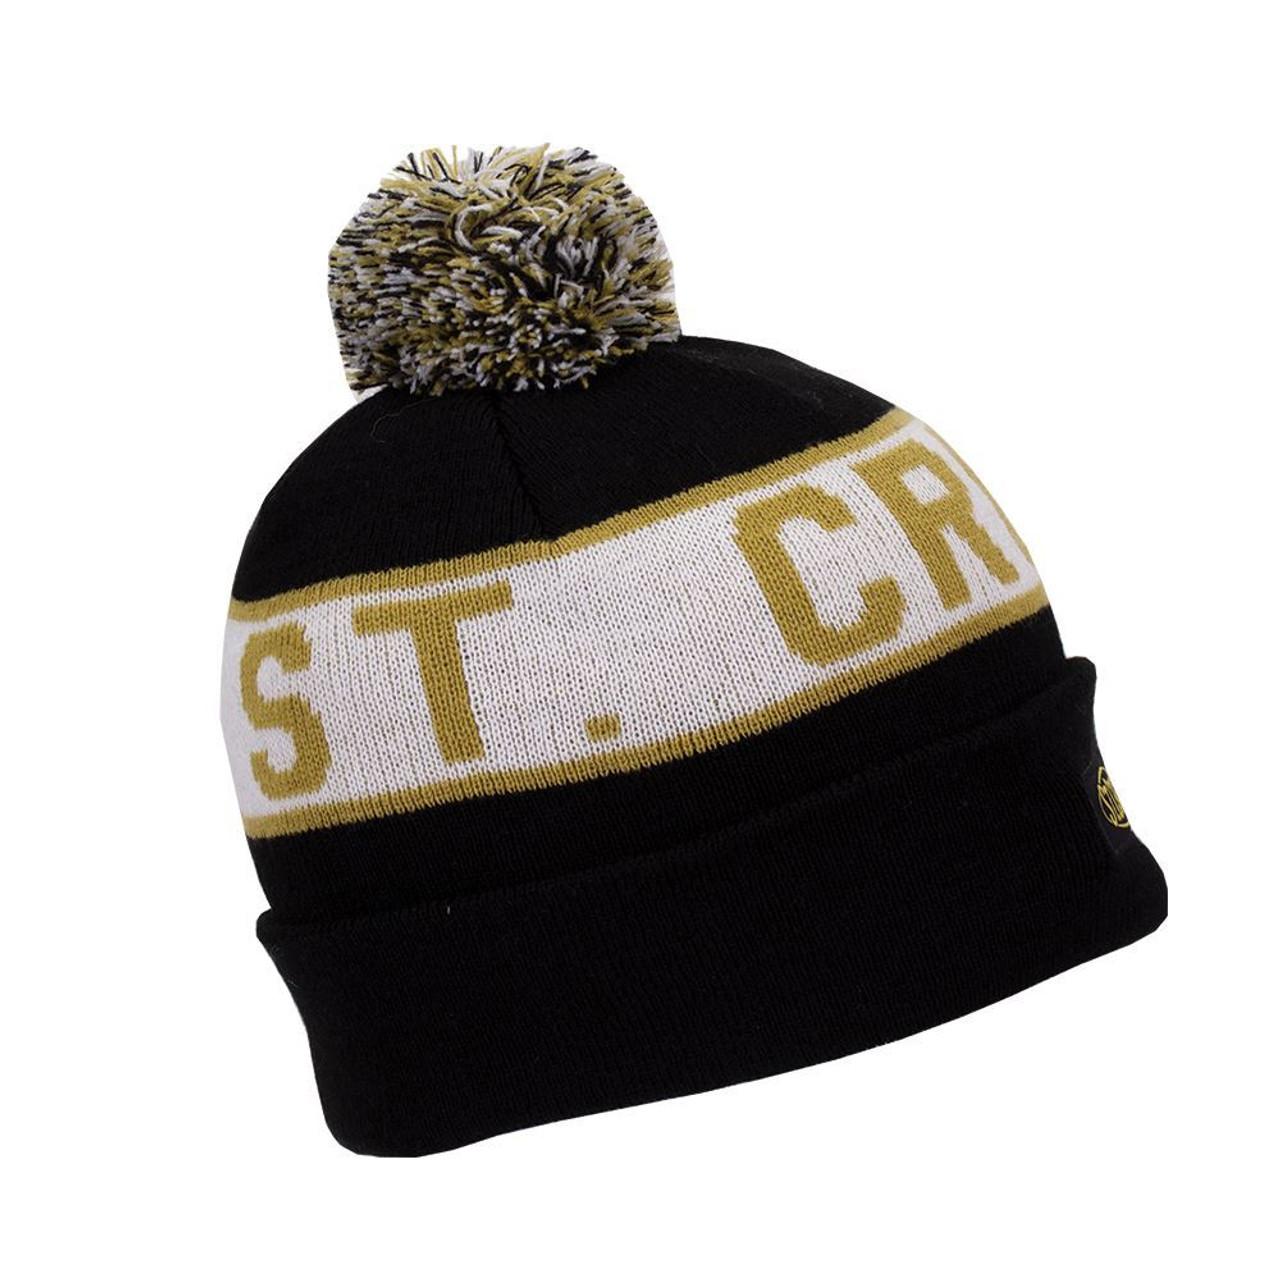 St. Croix Rods Black Ice POM Cap